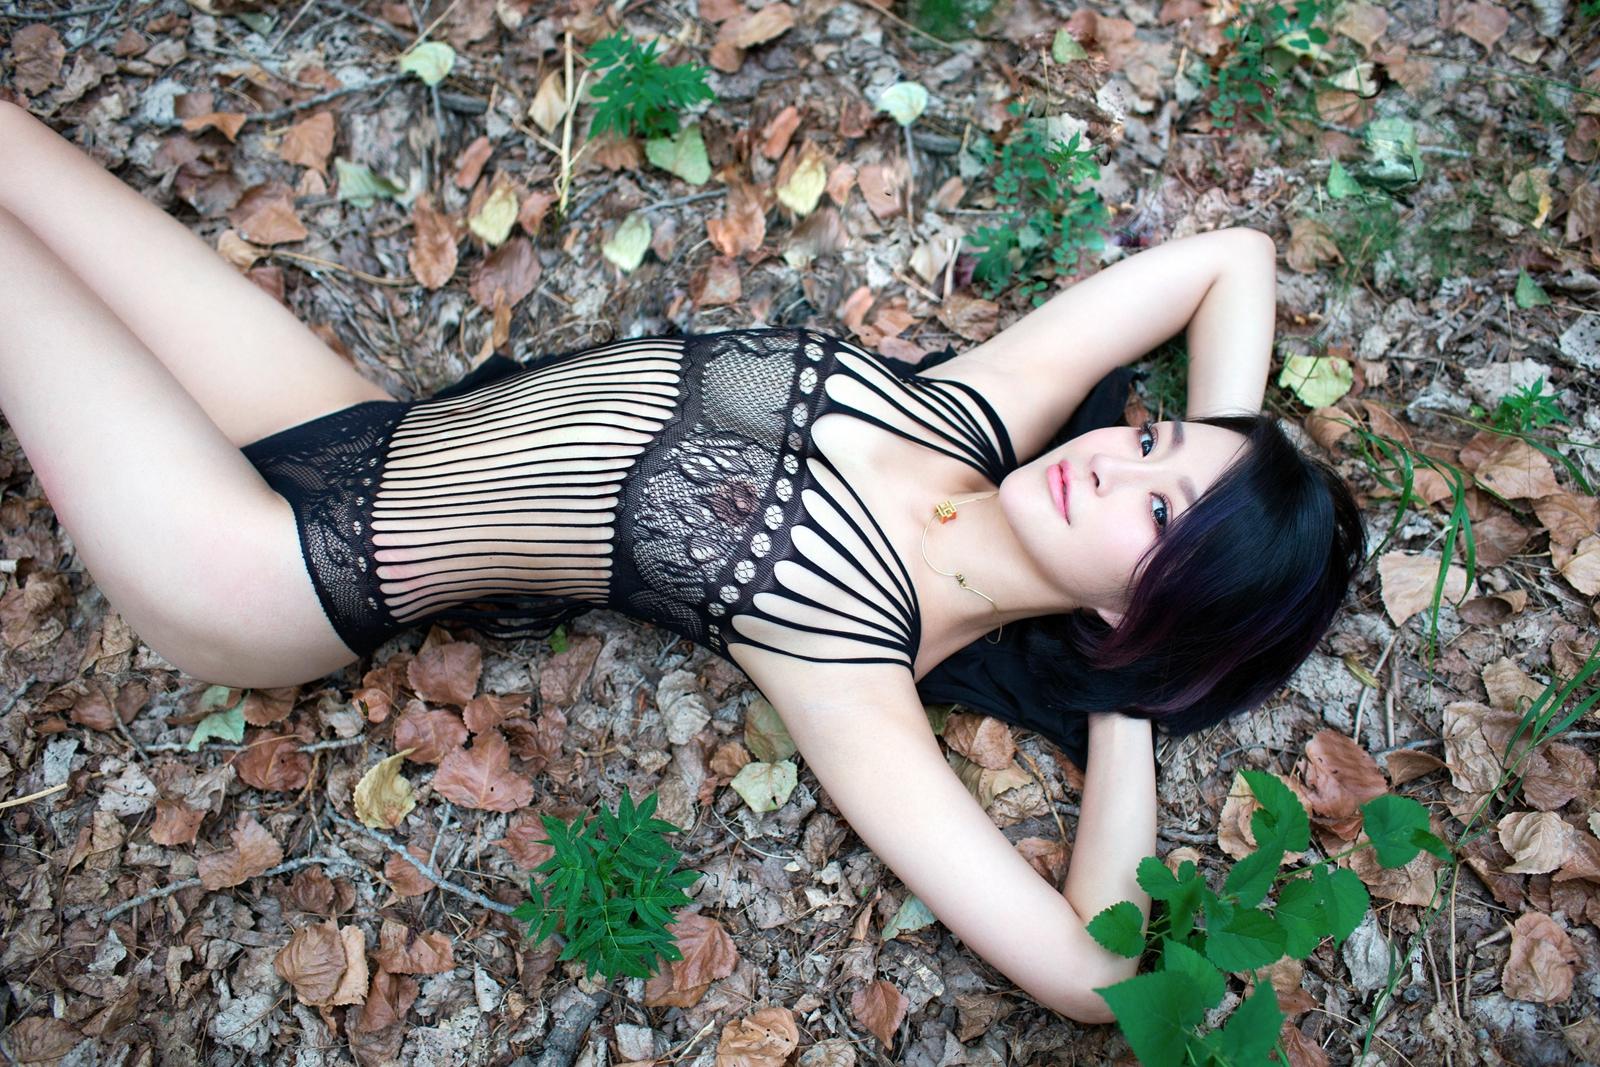 007 - Nude Girl TUIGIRL NO.45 Sexy Love Pussy